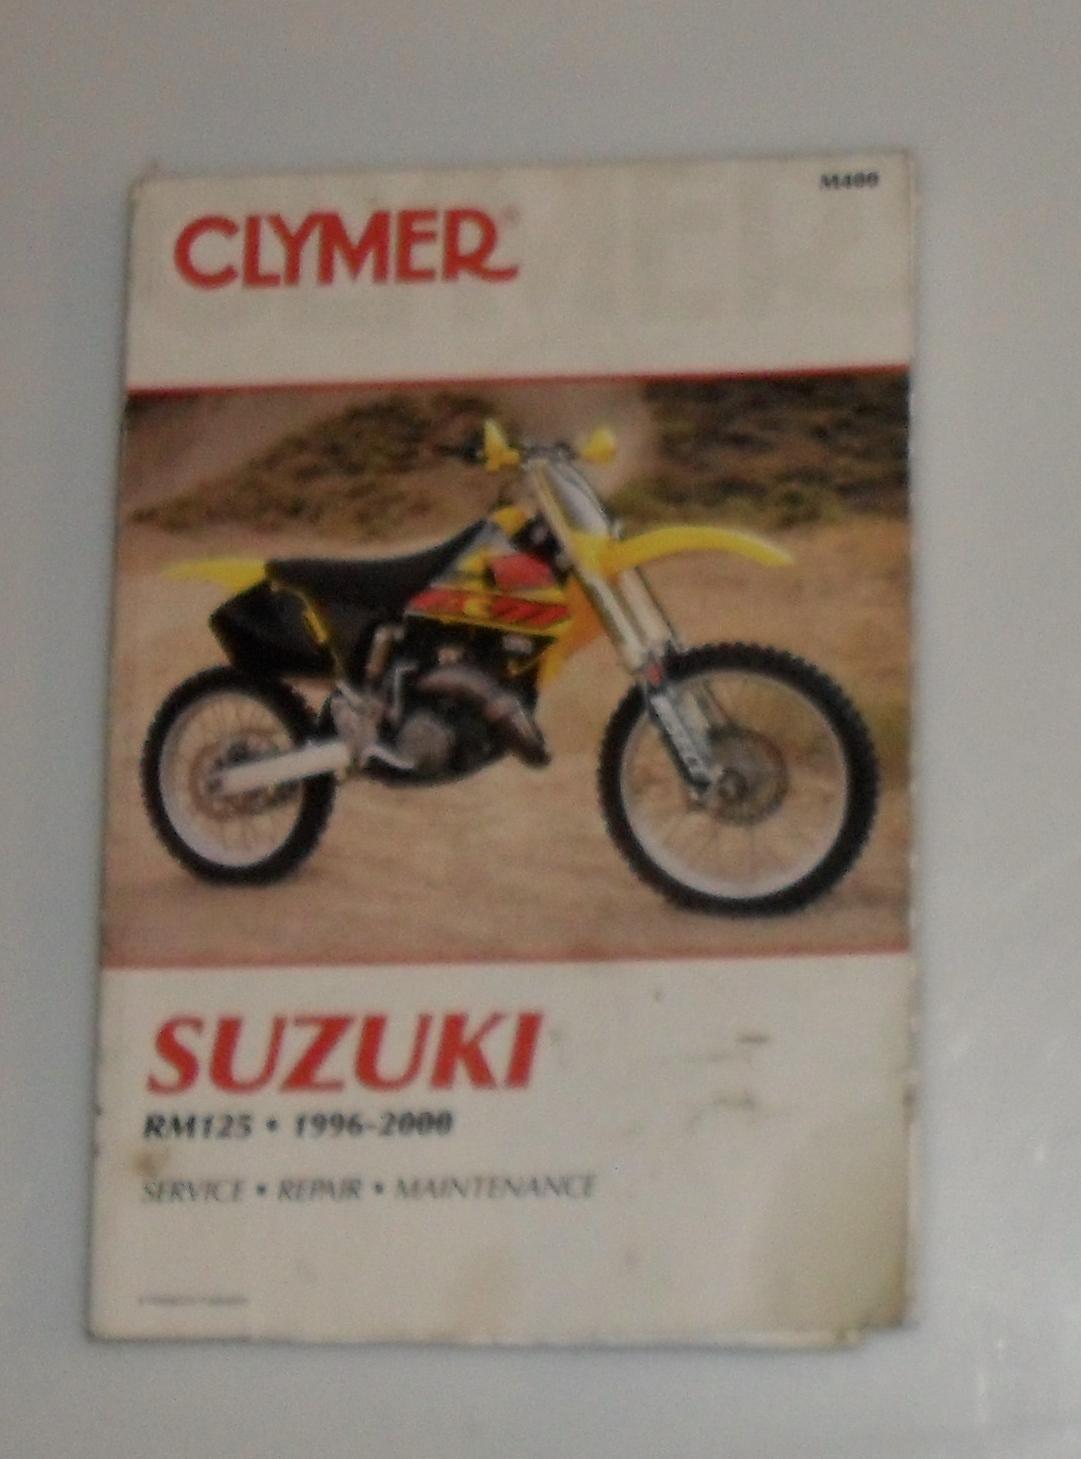 1996 suzuki rm125 service manual